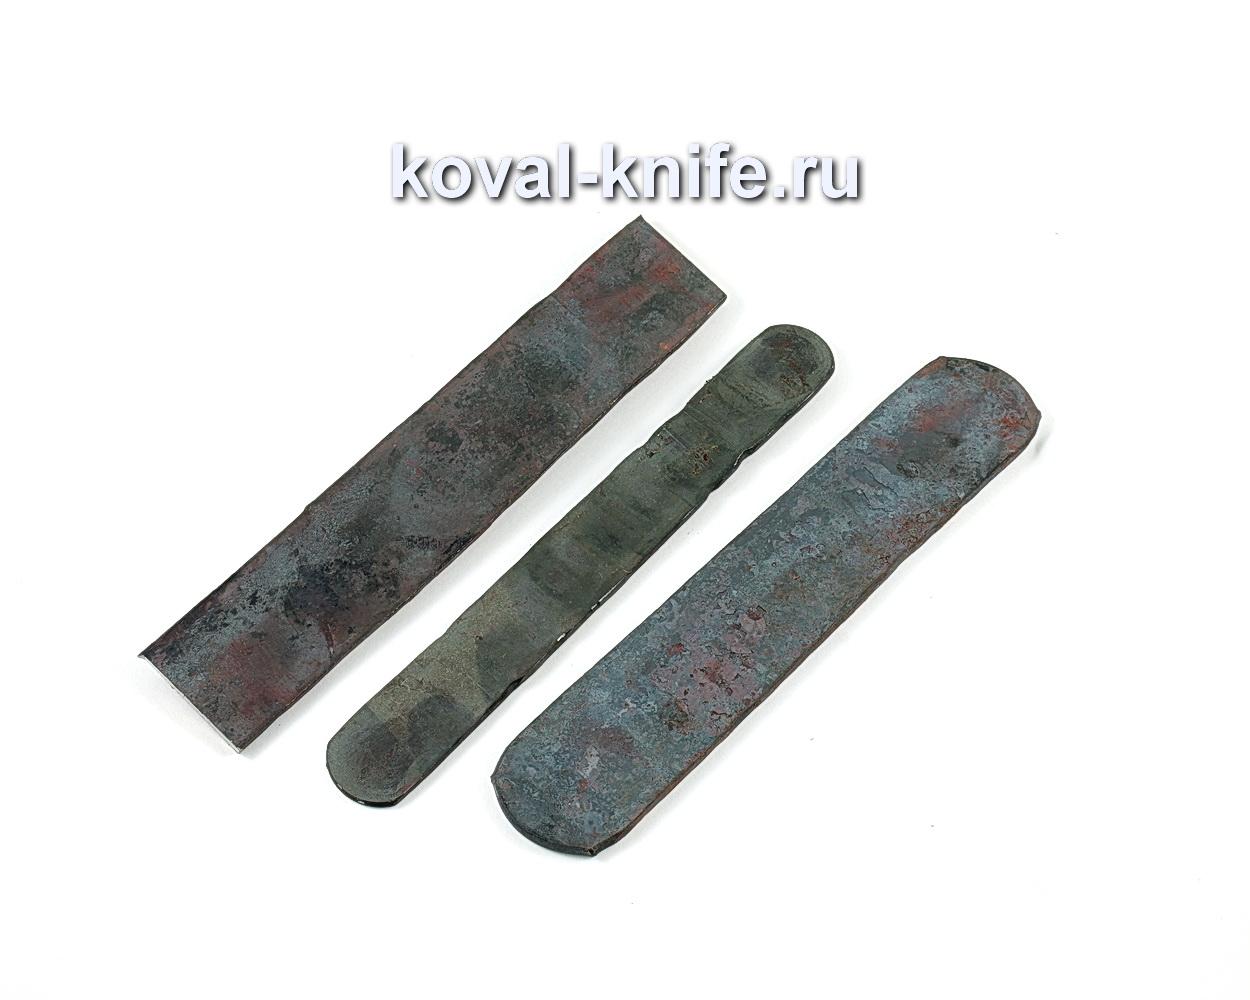 Кованая заготовка из алмазной стали ХВ5, 200-210х40х4мм.